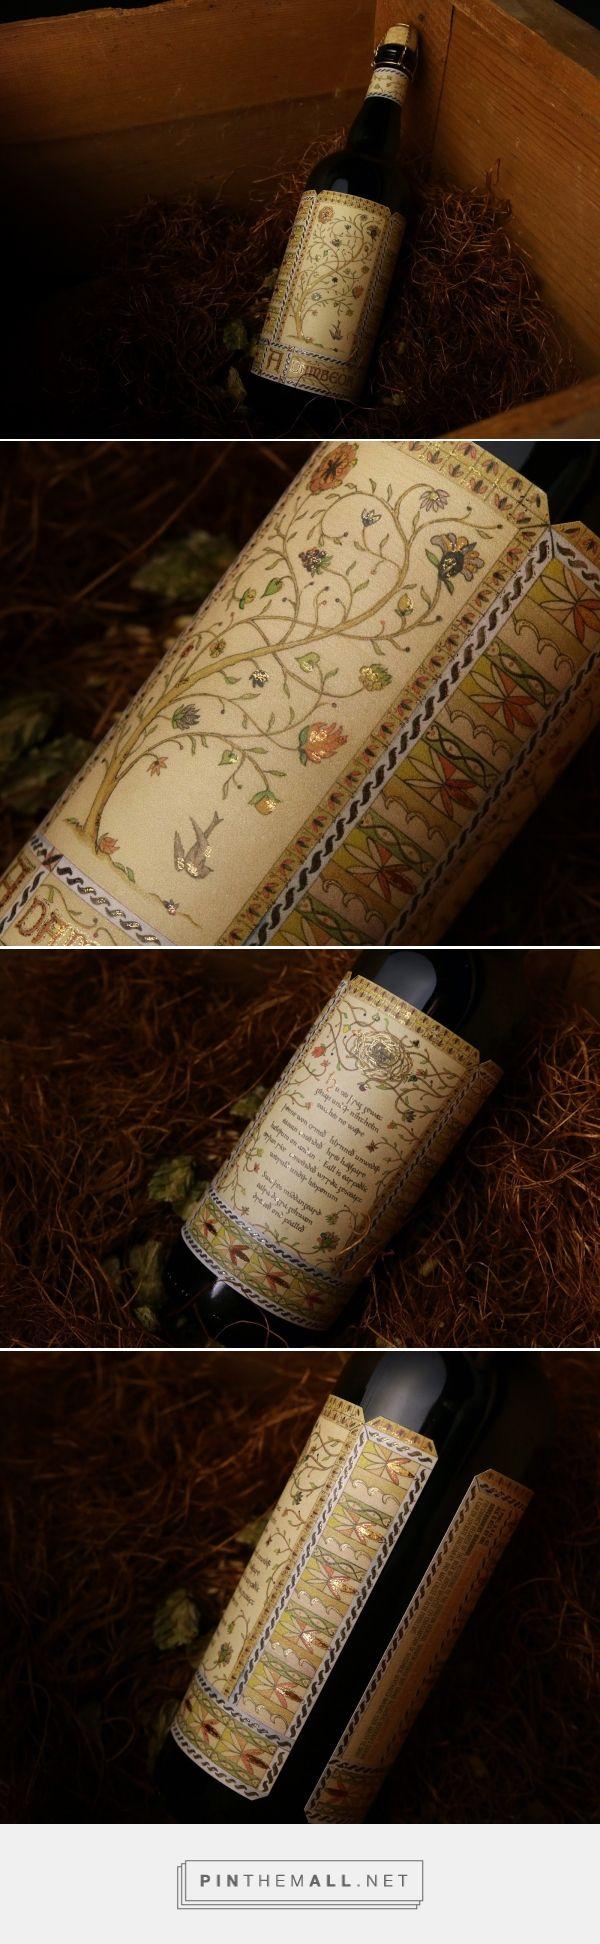 Adambeor Found beer packaging design by Watermark Design - http://www.packagingoftheworld.com/2017/12/adambeor-found.html